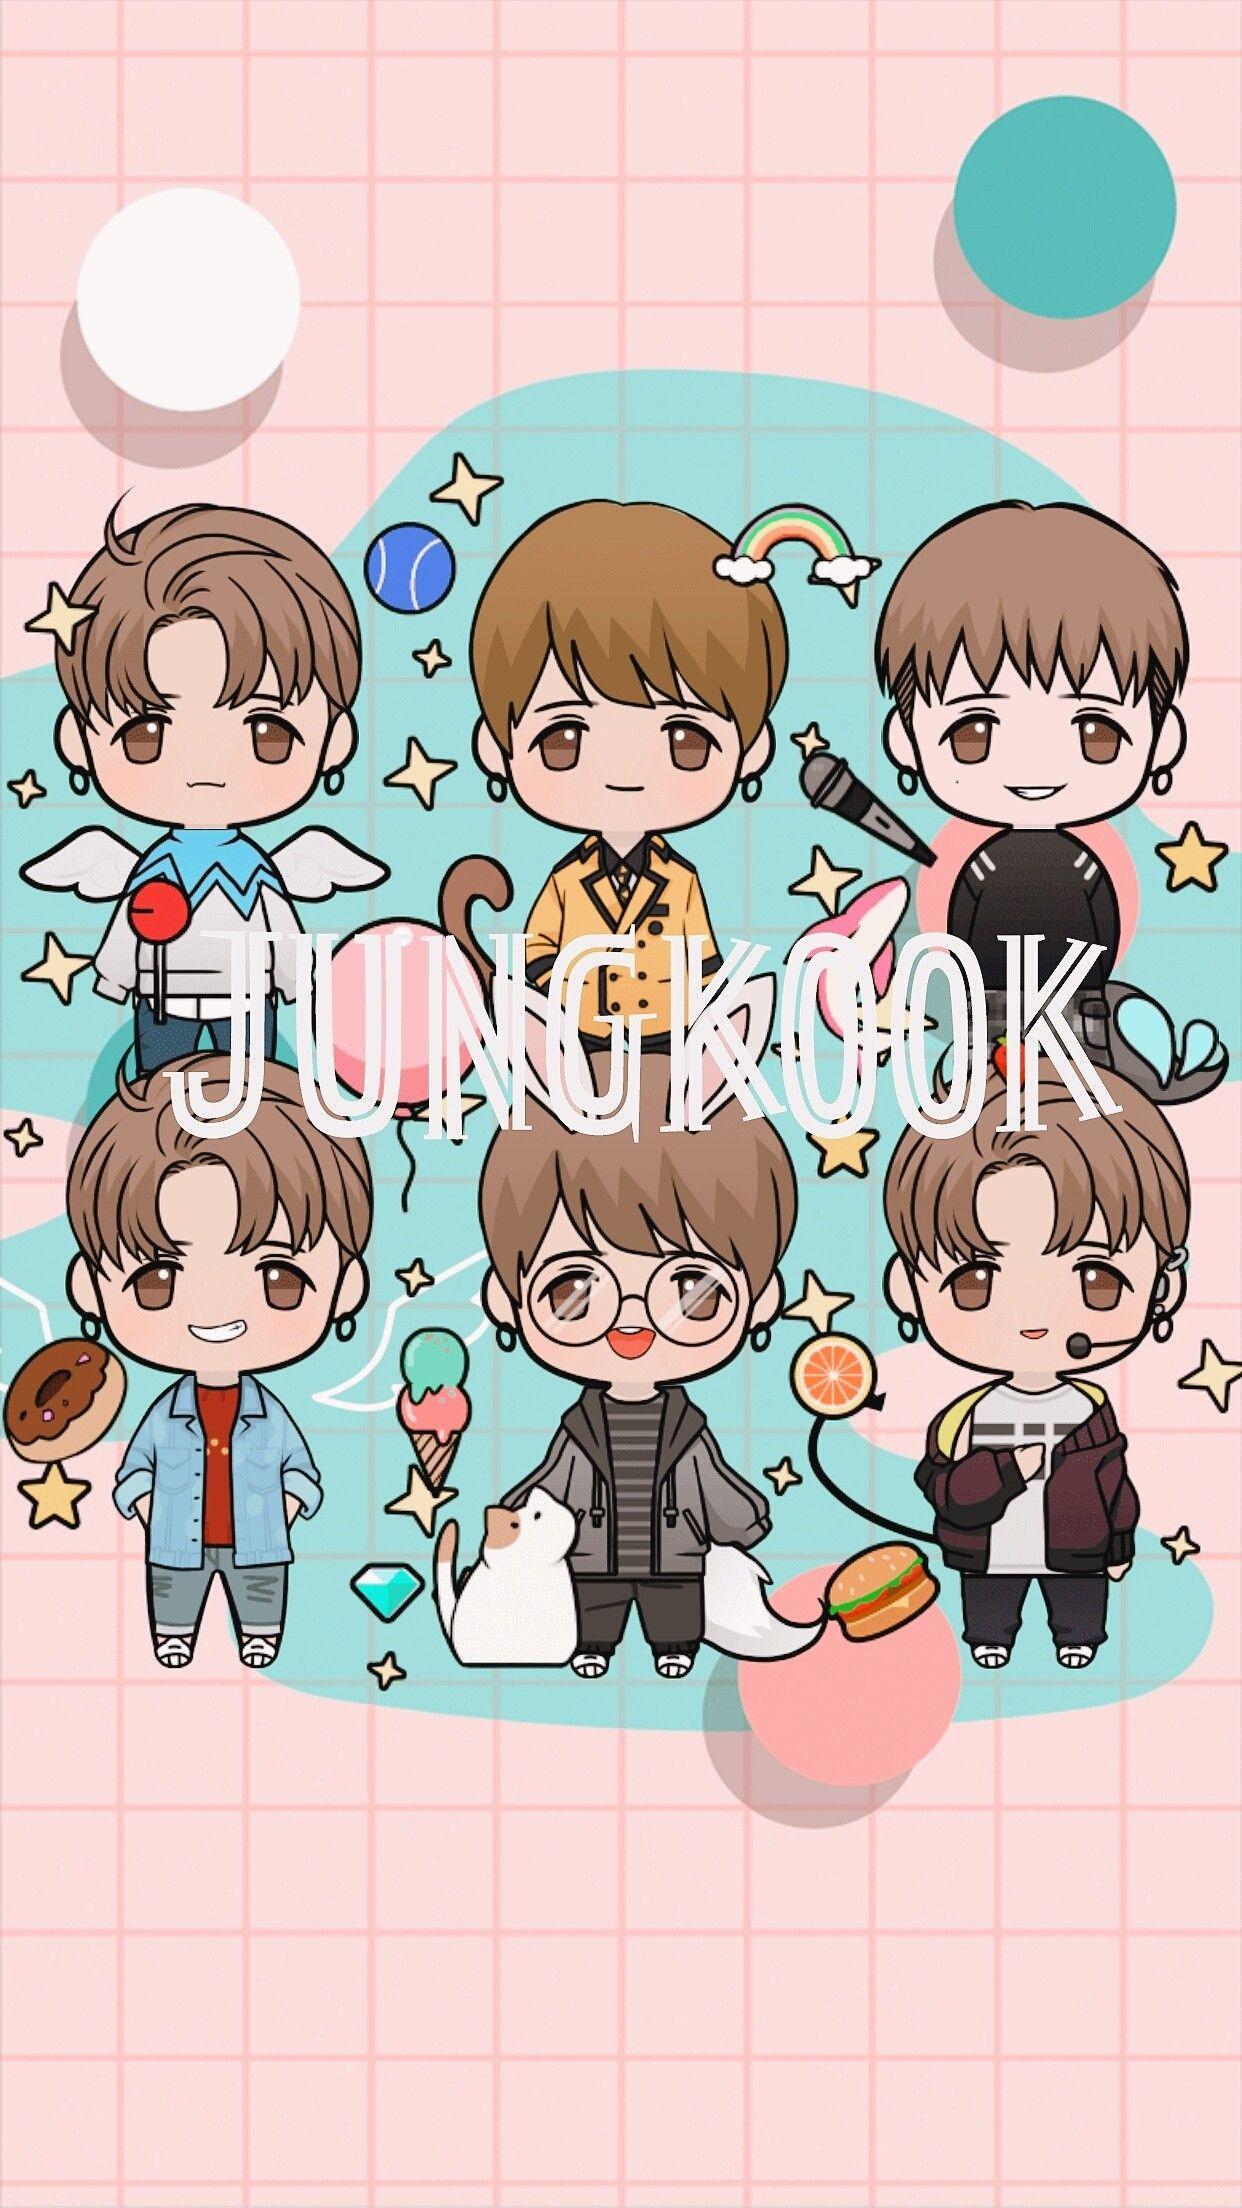 Jungkook Cartoon Wallpapers Wallpaper Cave